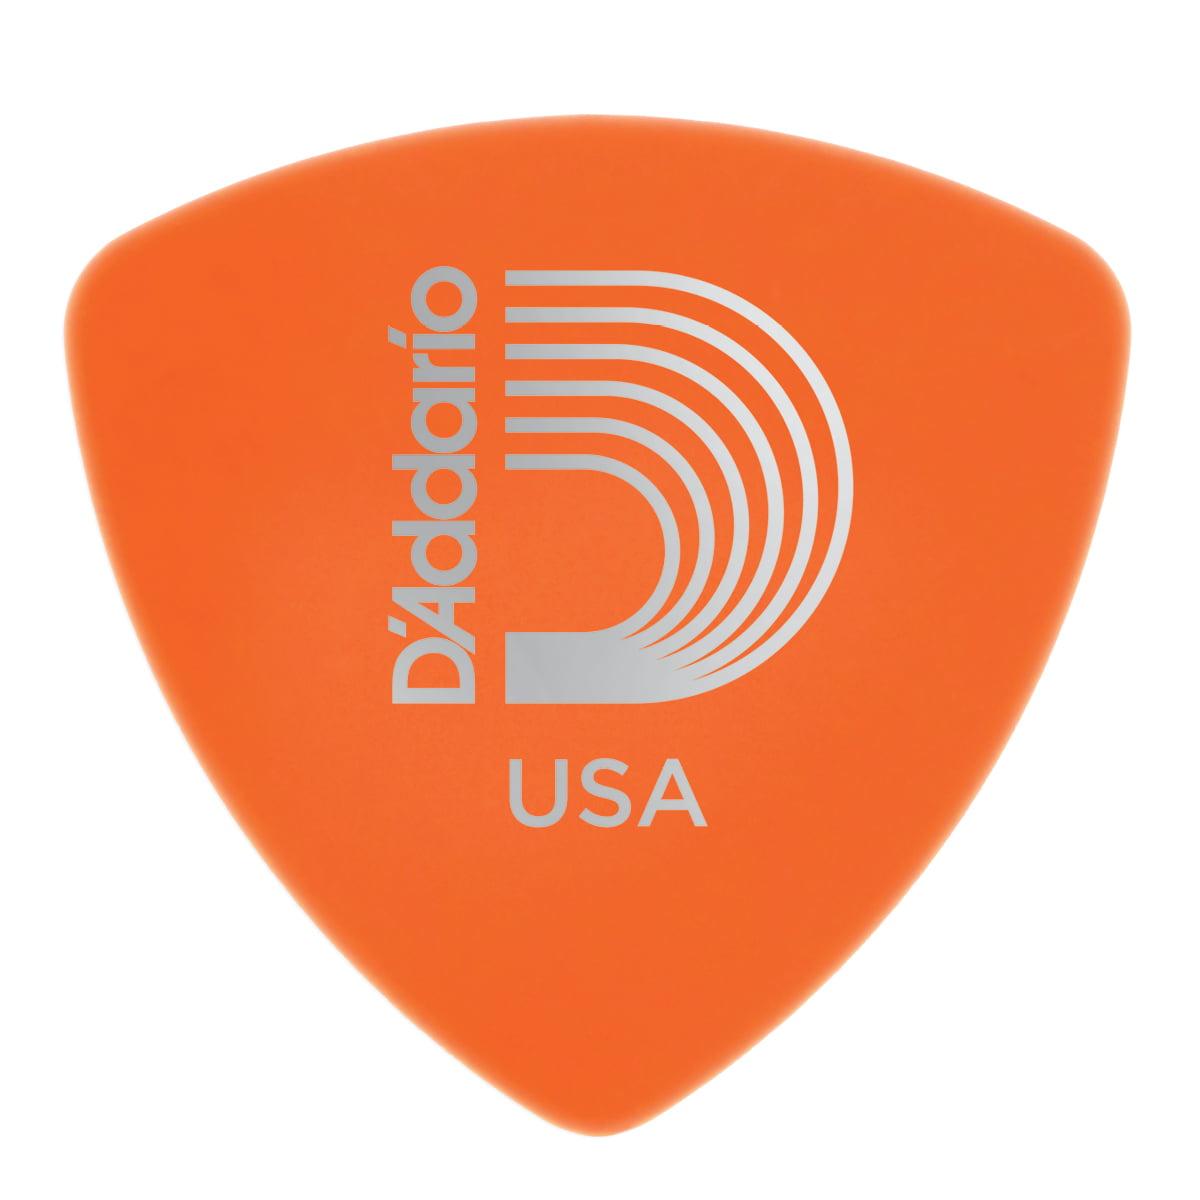 Planet Waves Duralin Guitar Picks, Light, 10 pack, Wide Shape by